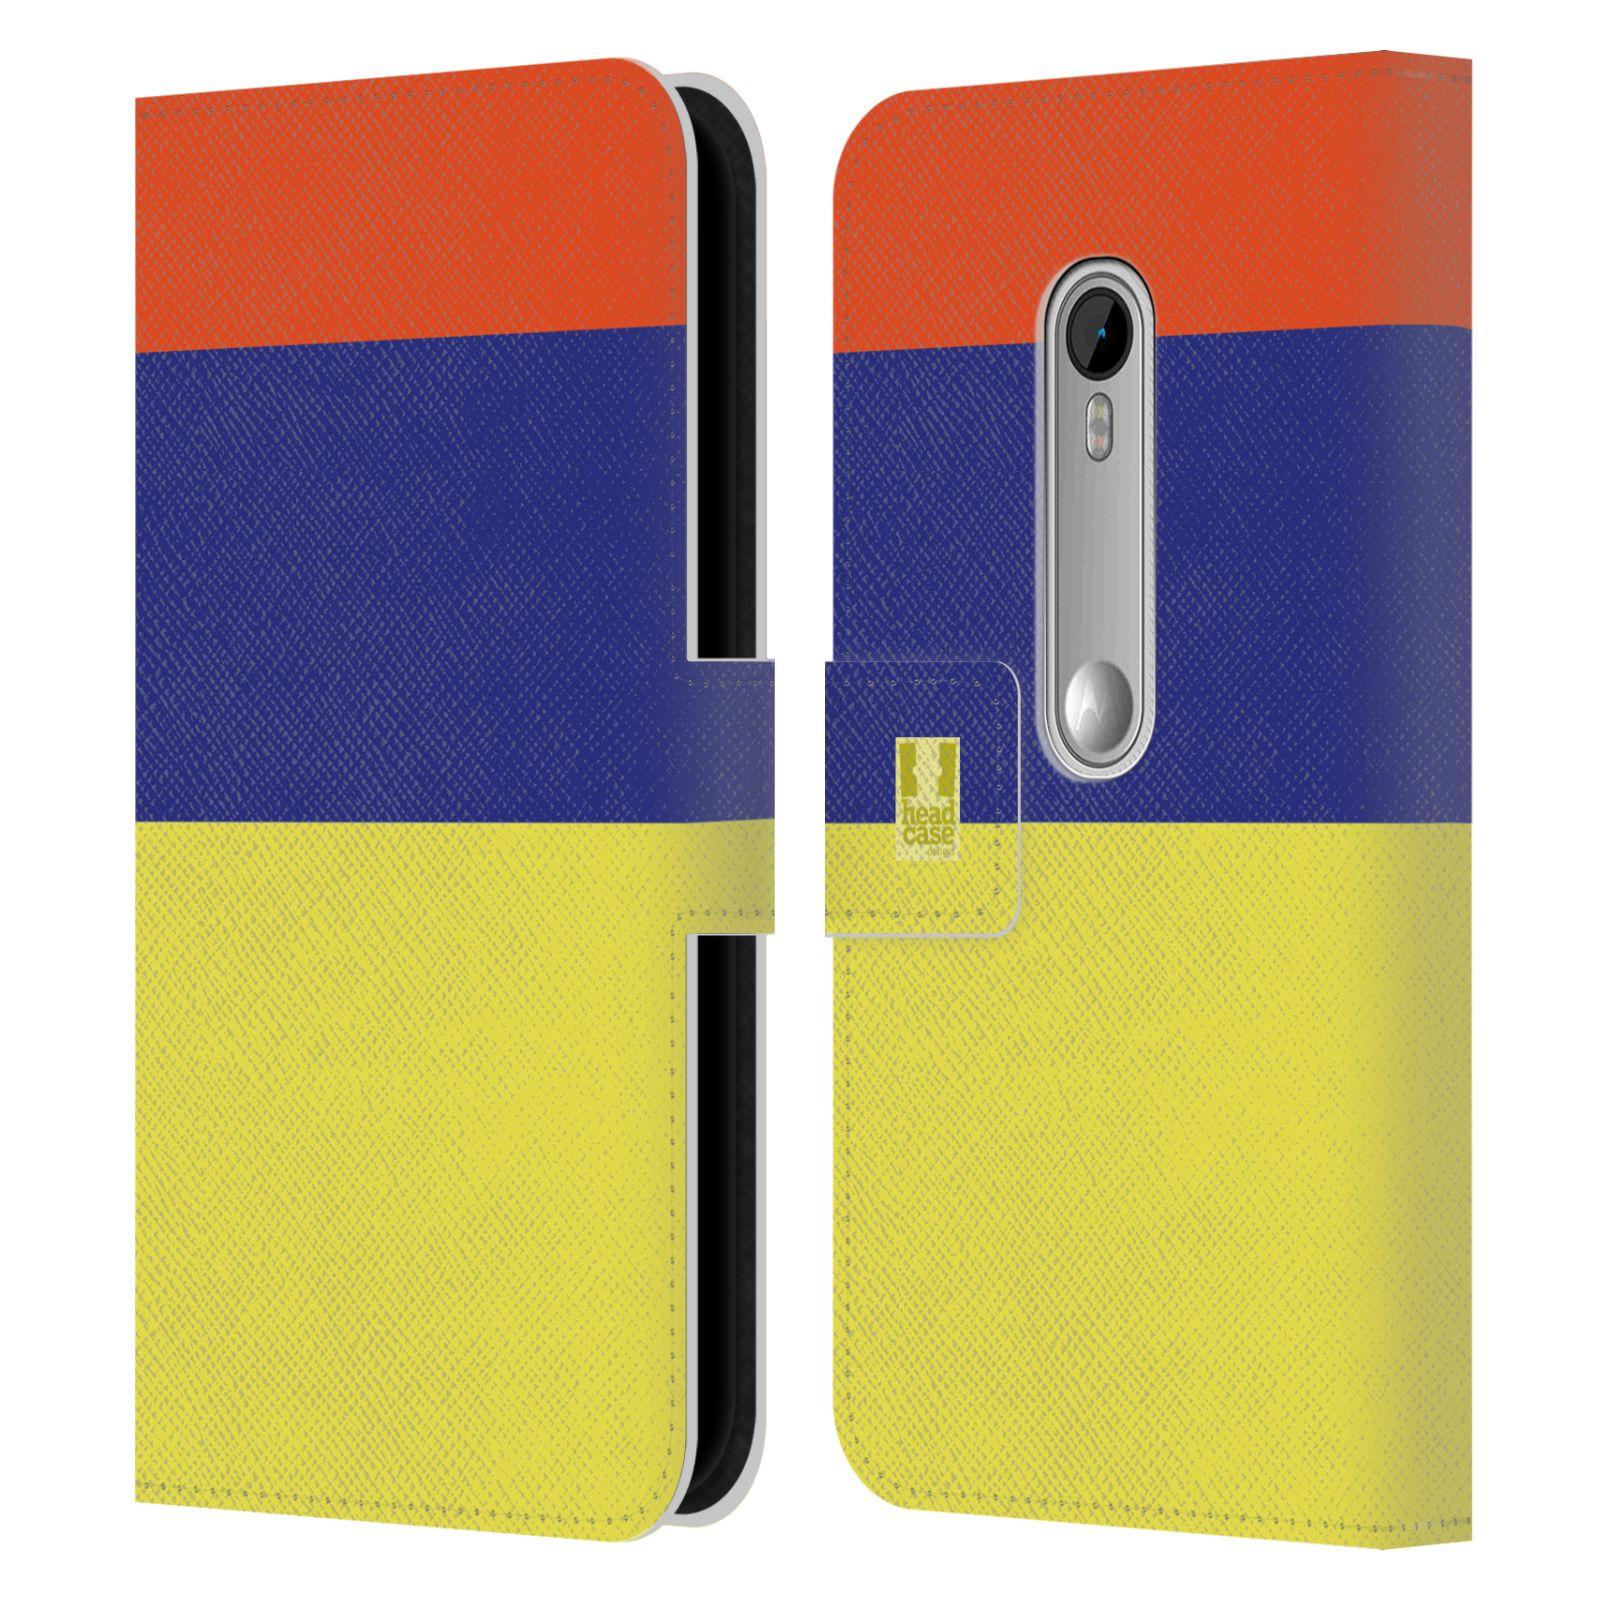 HEAD CASE Flipové pouzdro pro mobil Motorola MOTO G 3RD GENERATION barevné tvary žlutá, modrá, červená